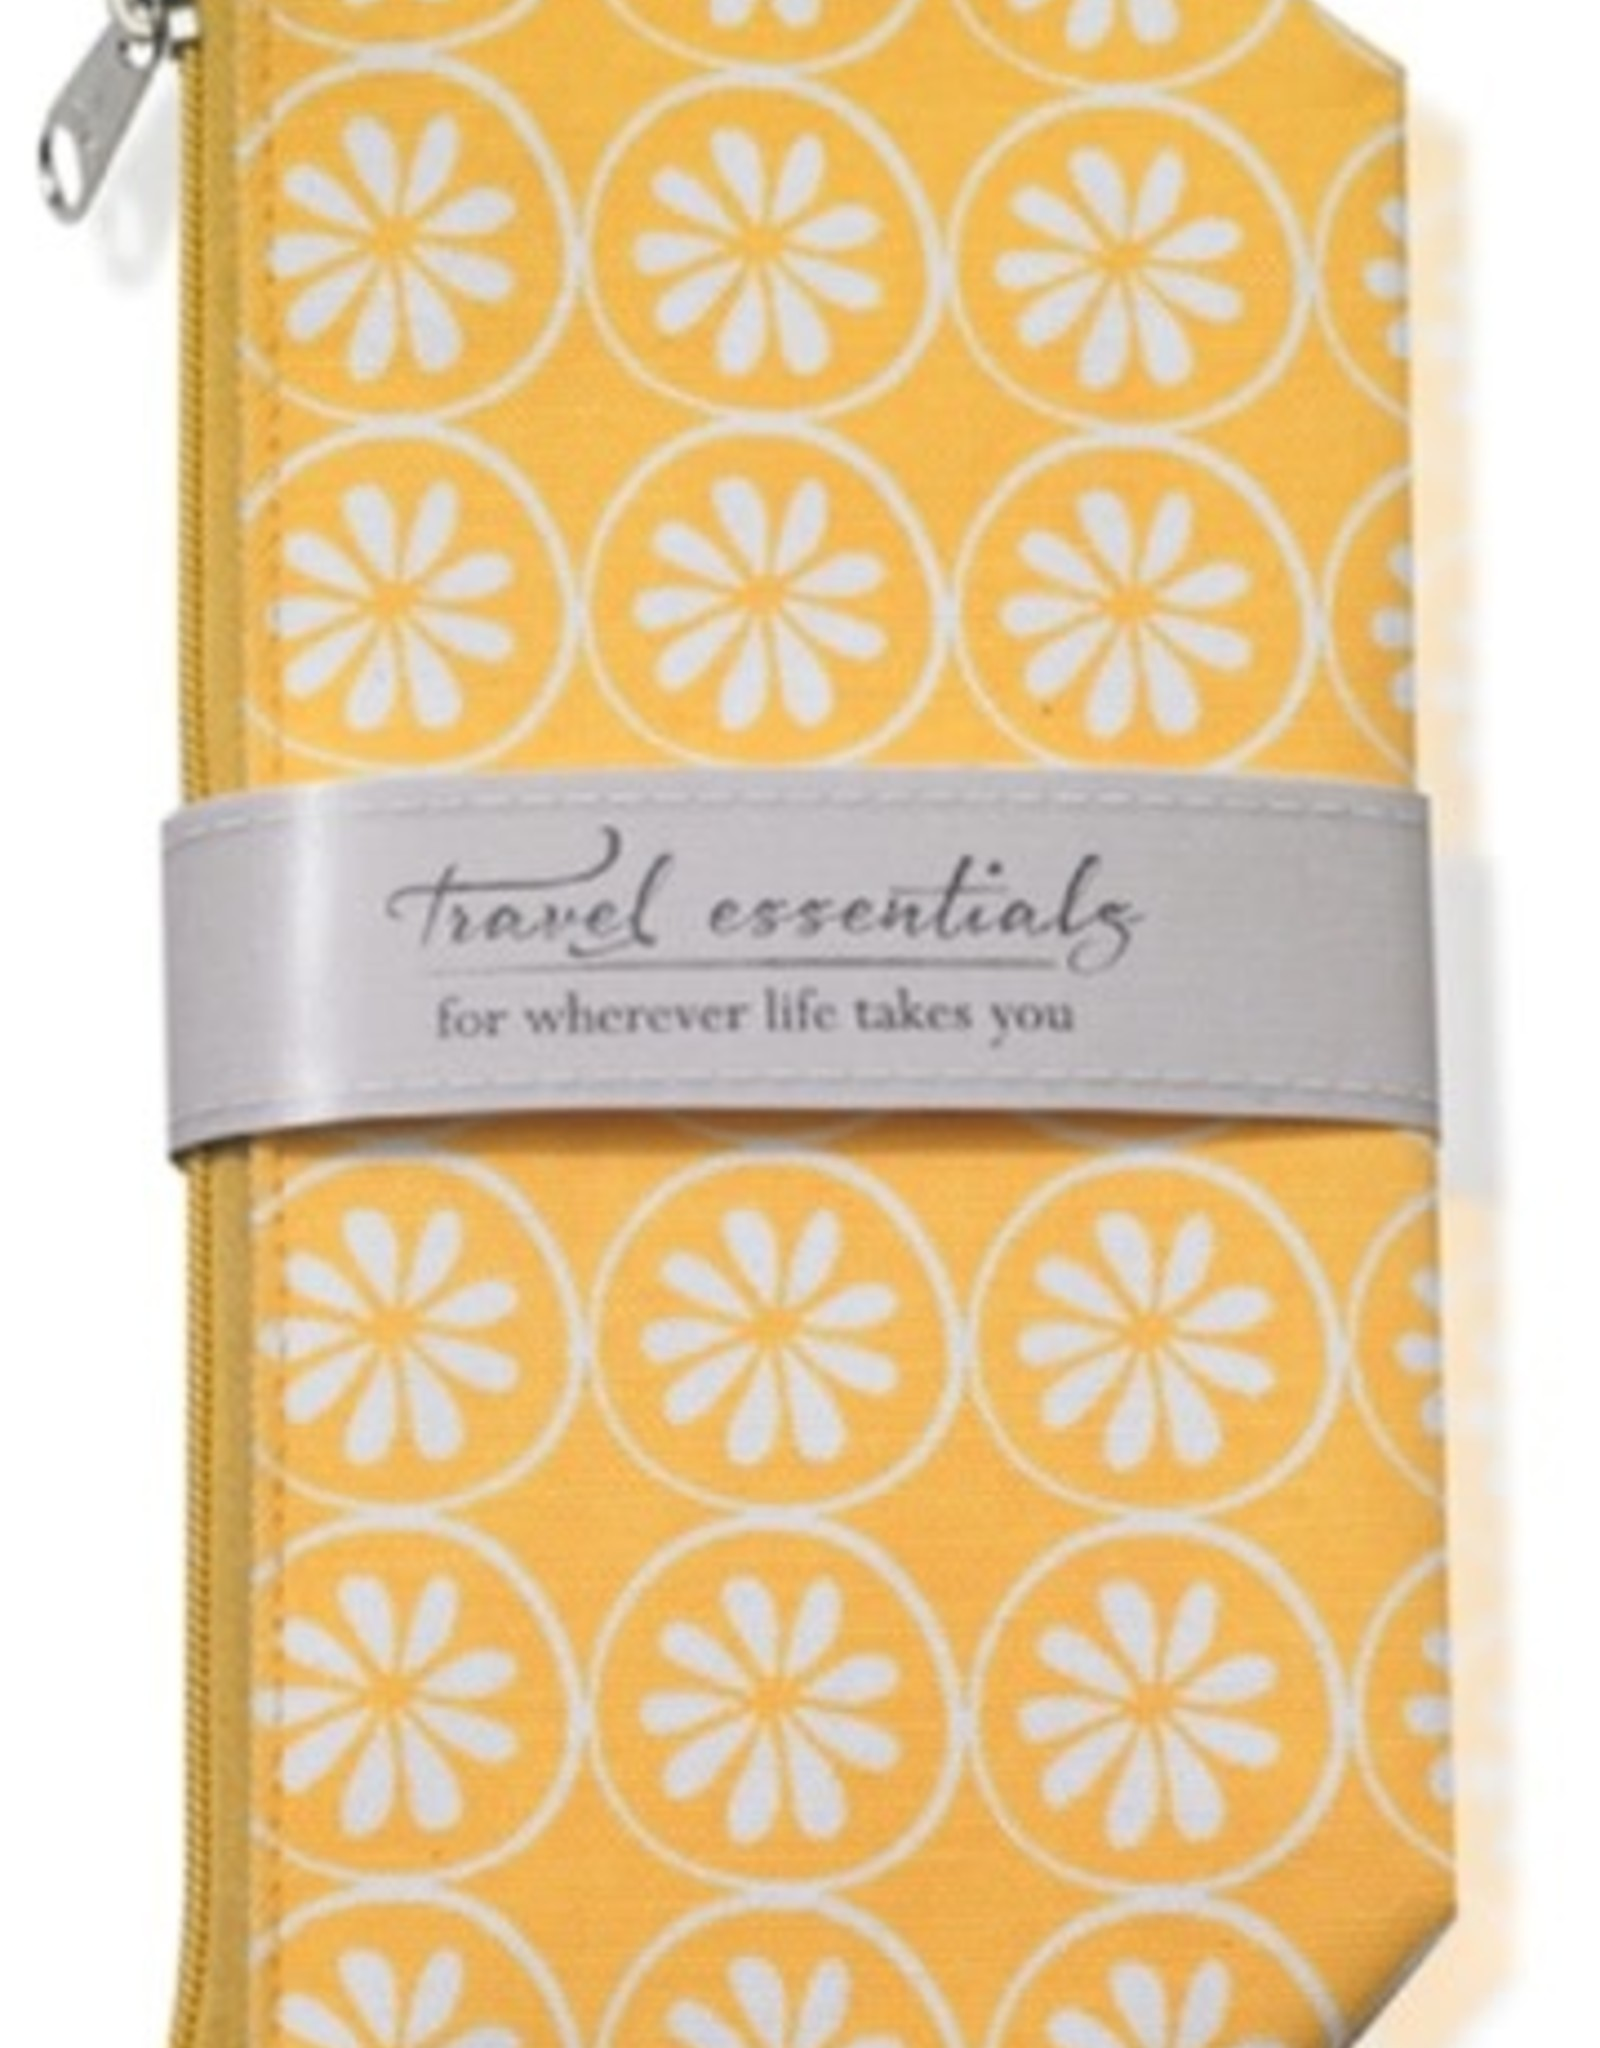 Mangiacotti Travel Essentials Canvas Bag